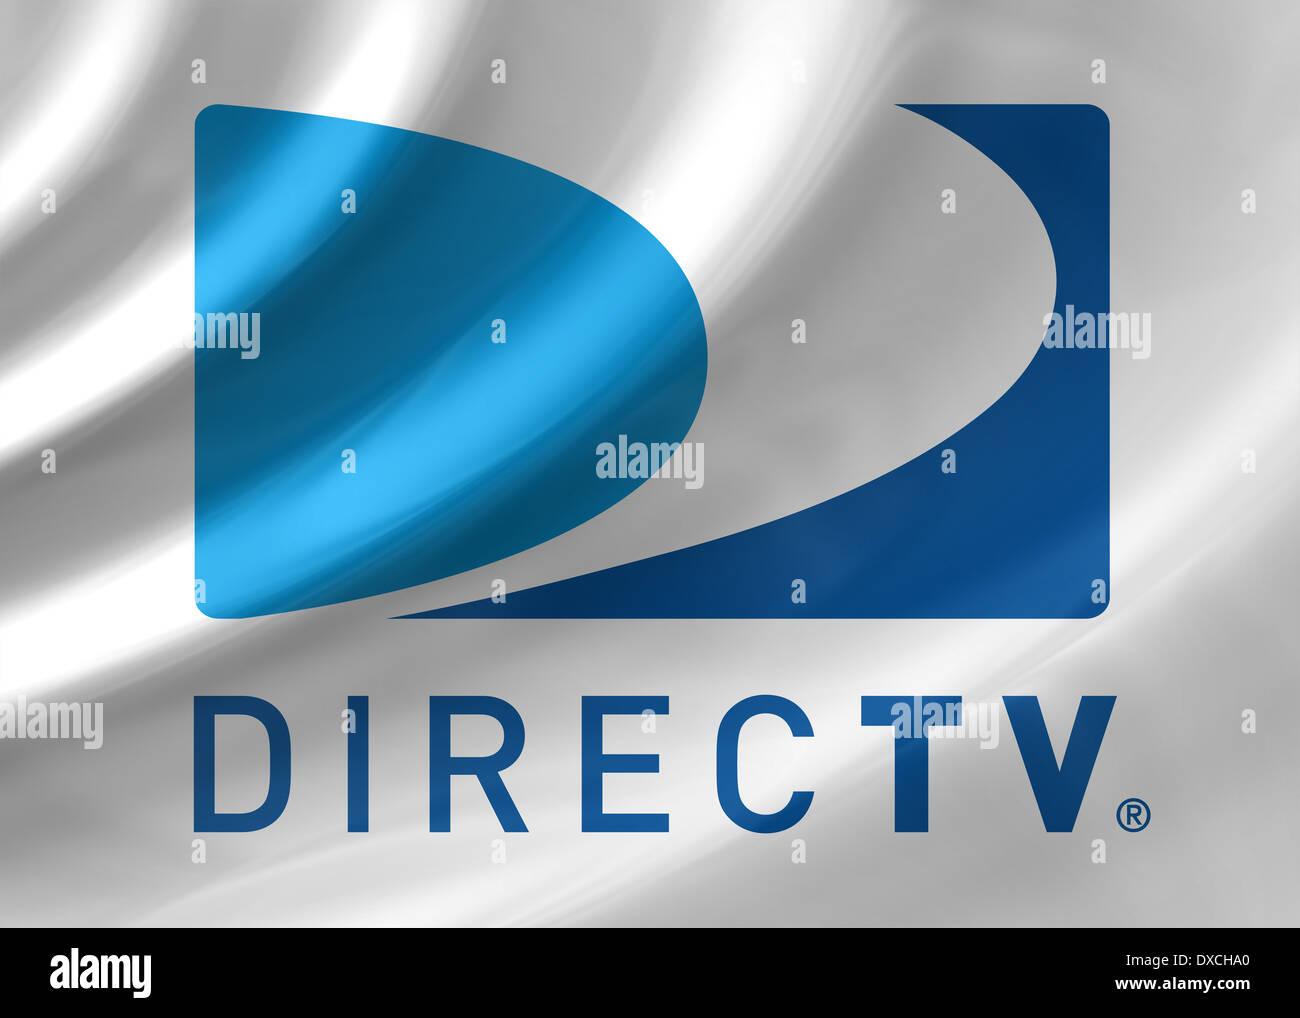 direct tv volkswagen jetta stereo wiring diagram logo symbol icon flag emblem stock photo